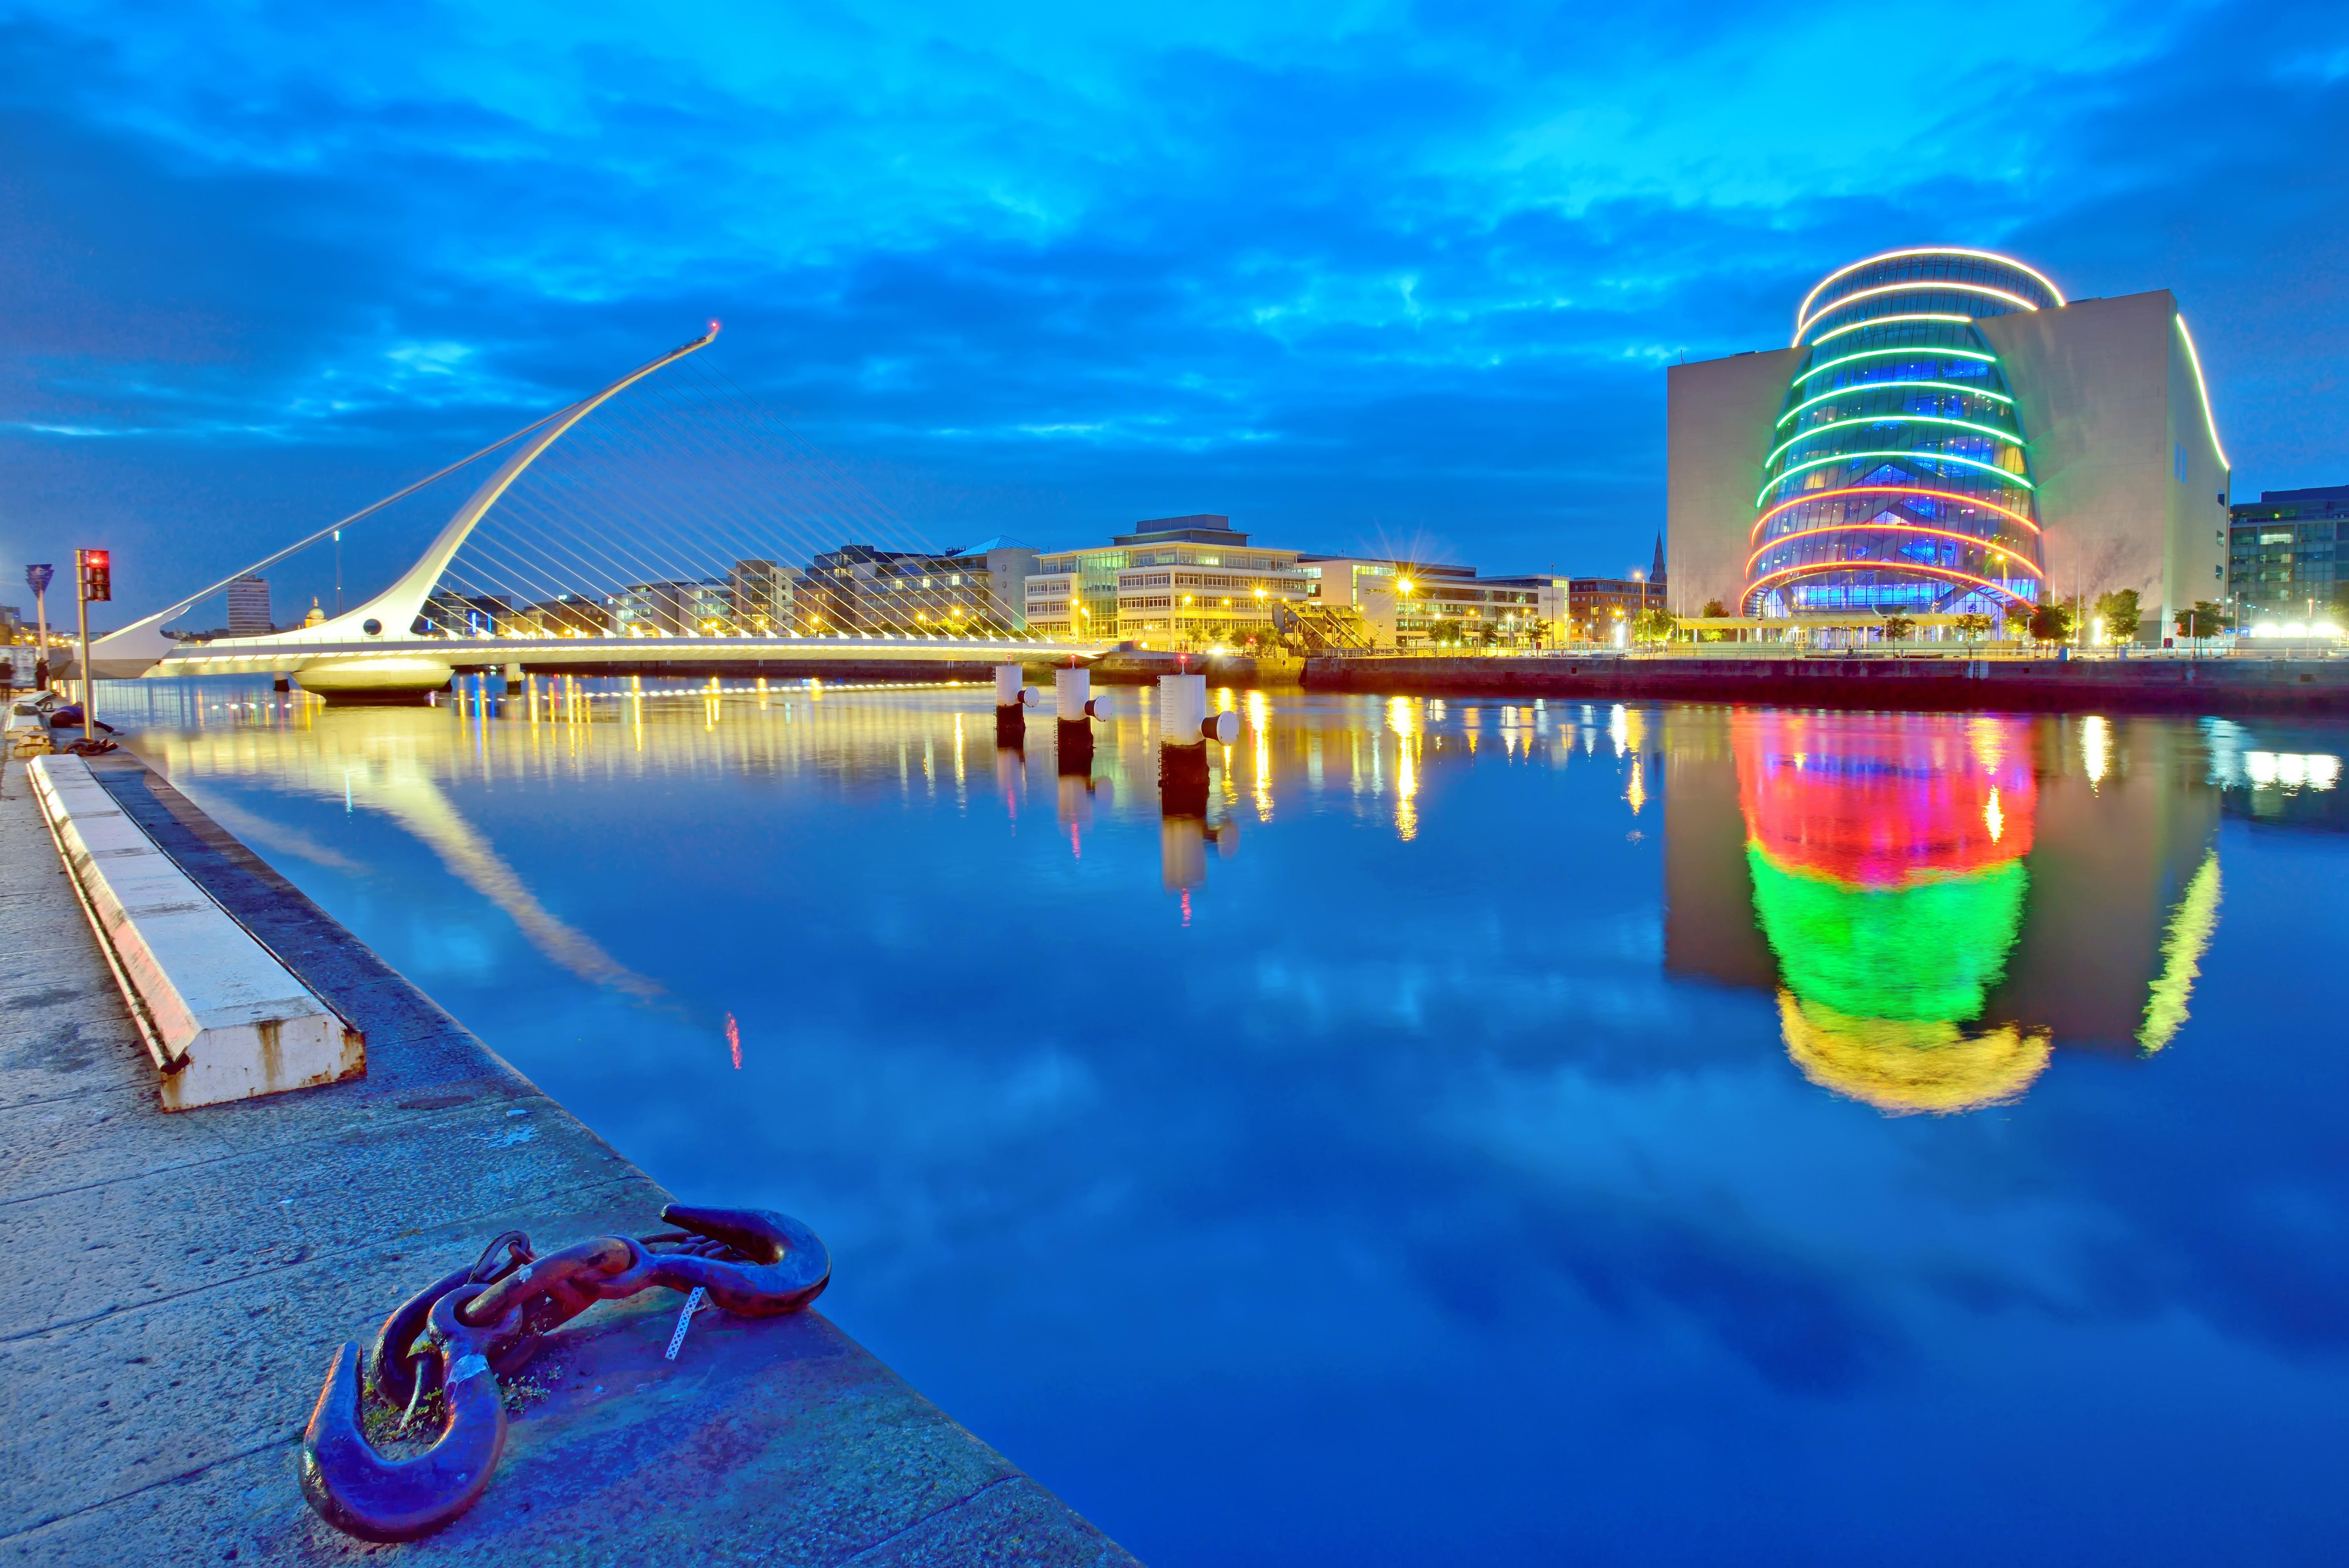 Cloudflare Datacenter in Dublin, Ireland